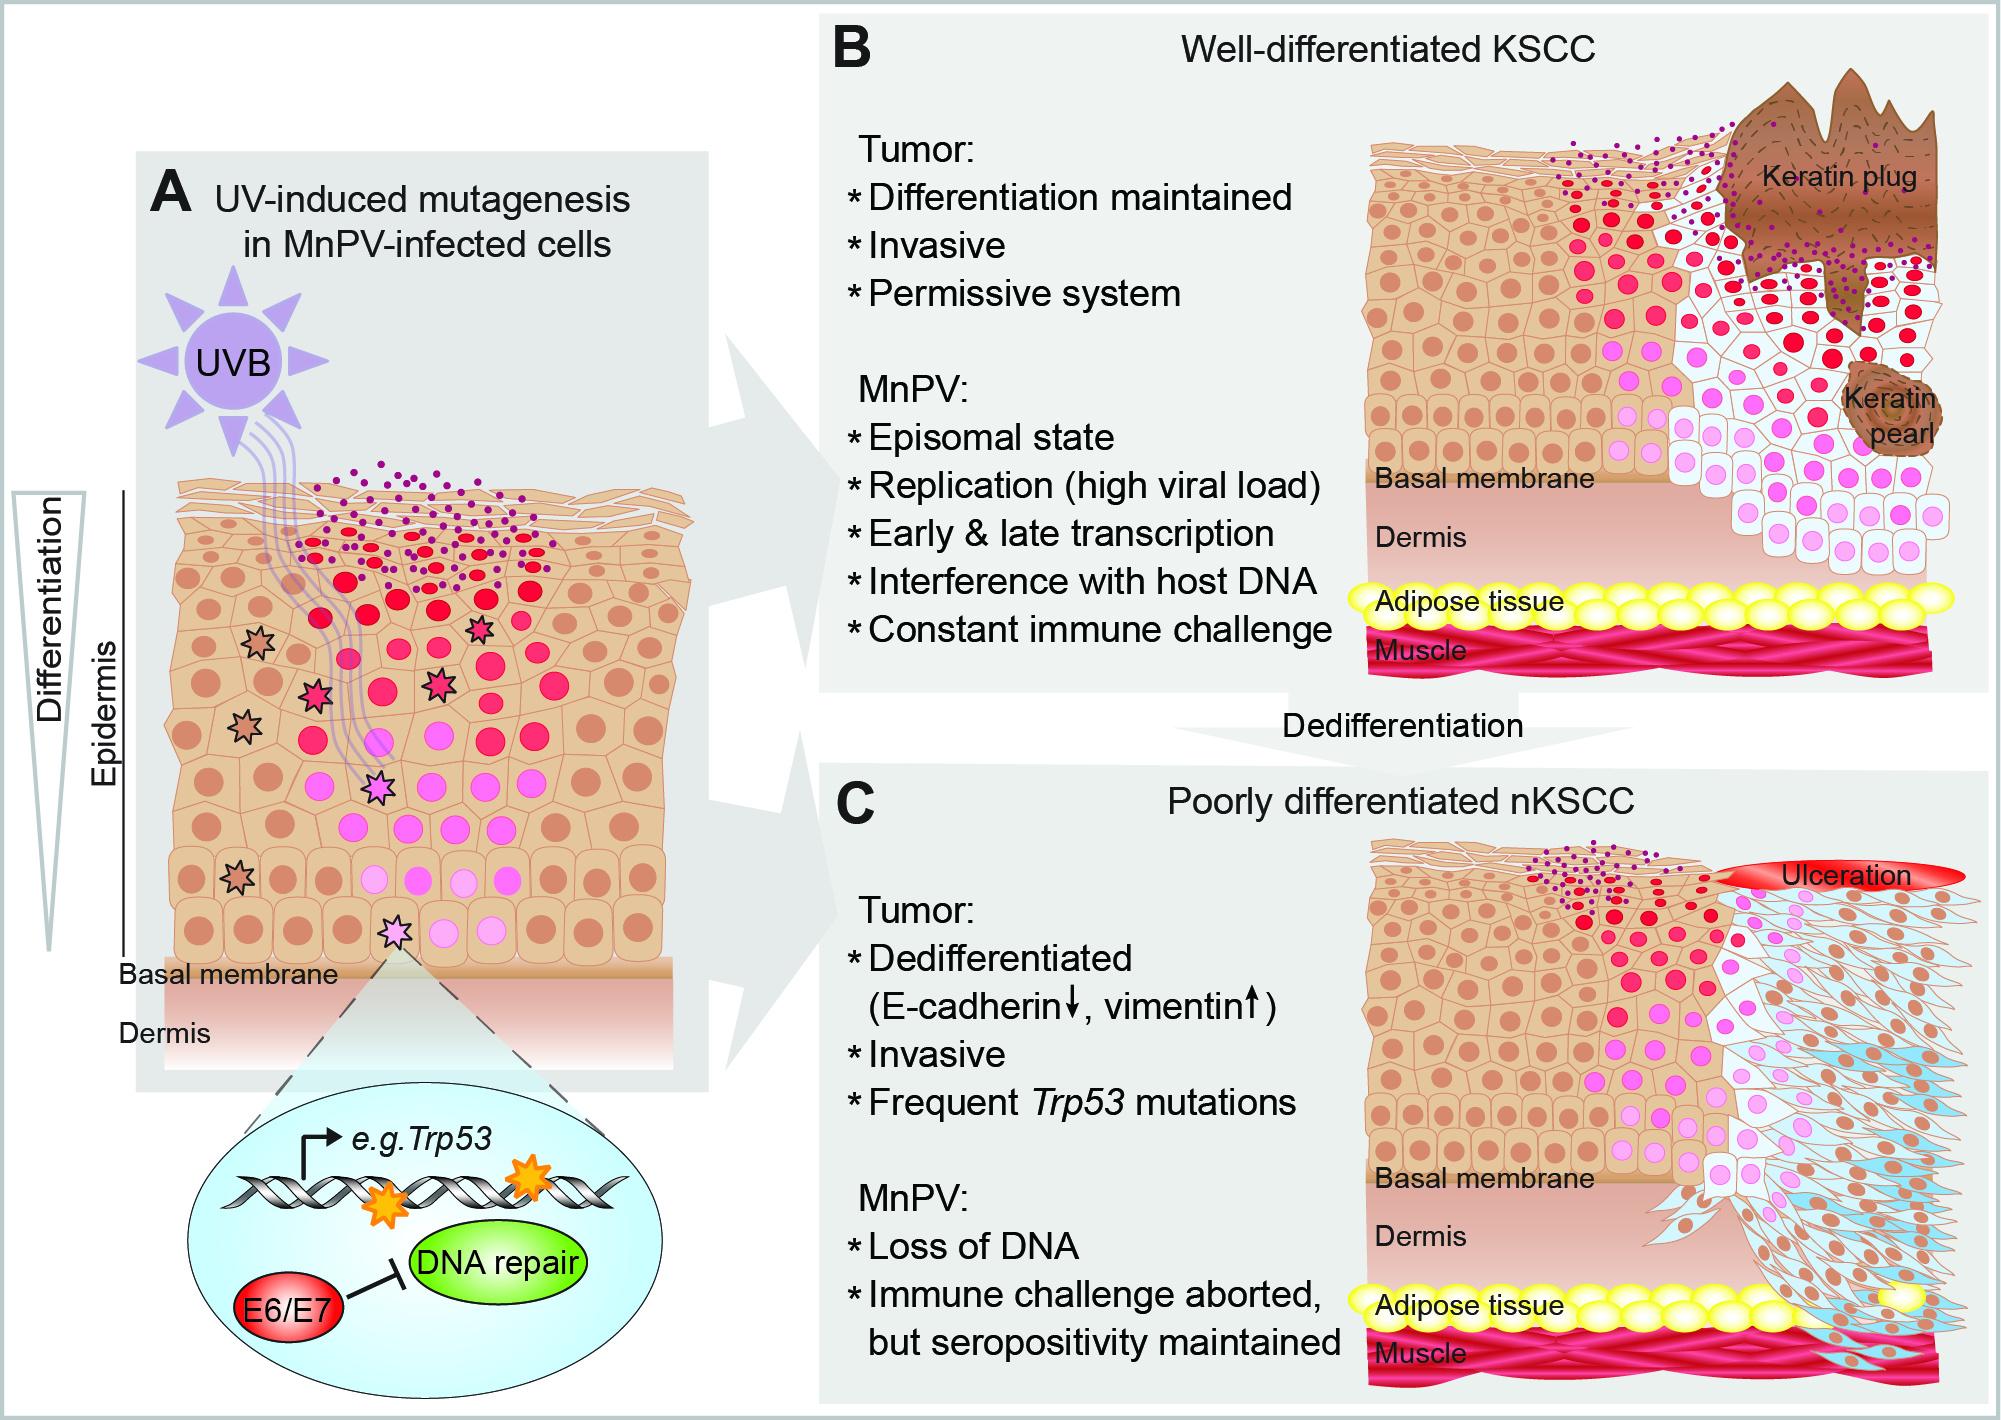 papilloma development tumor)